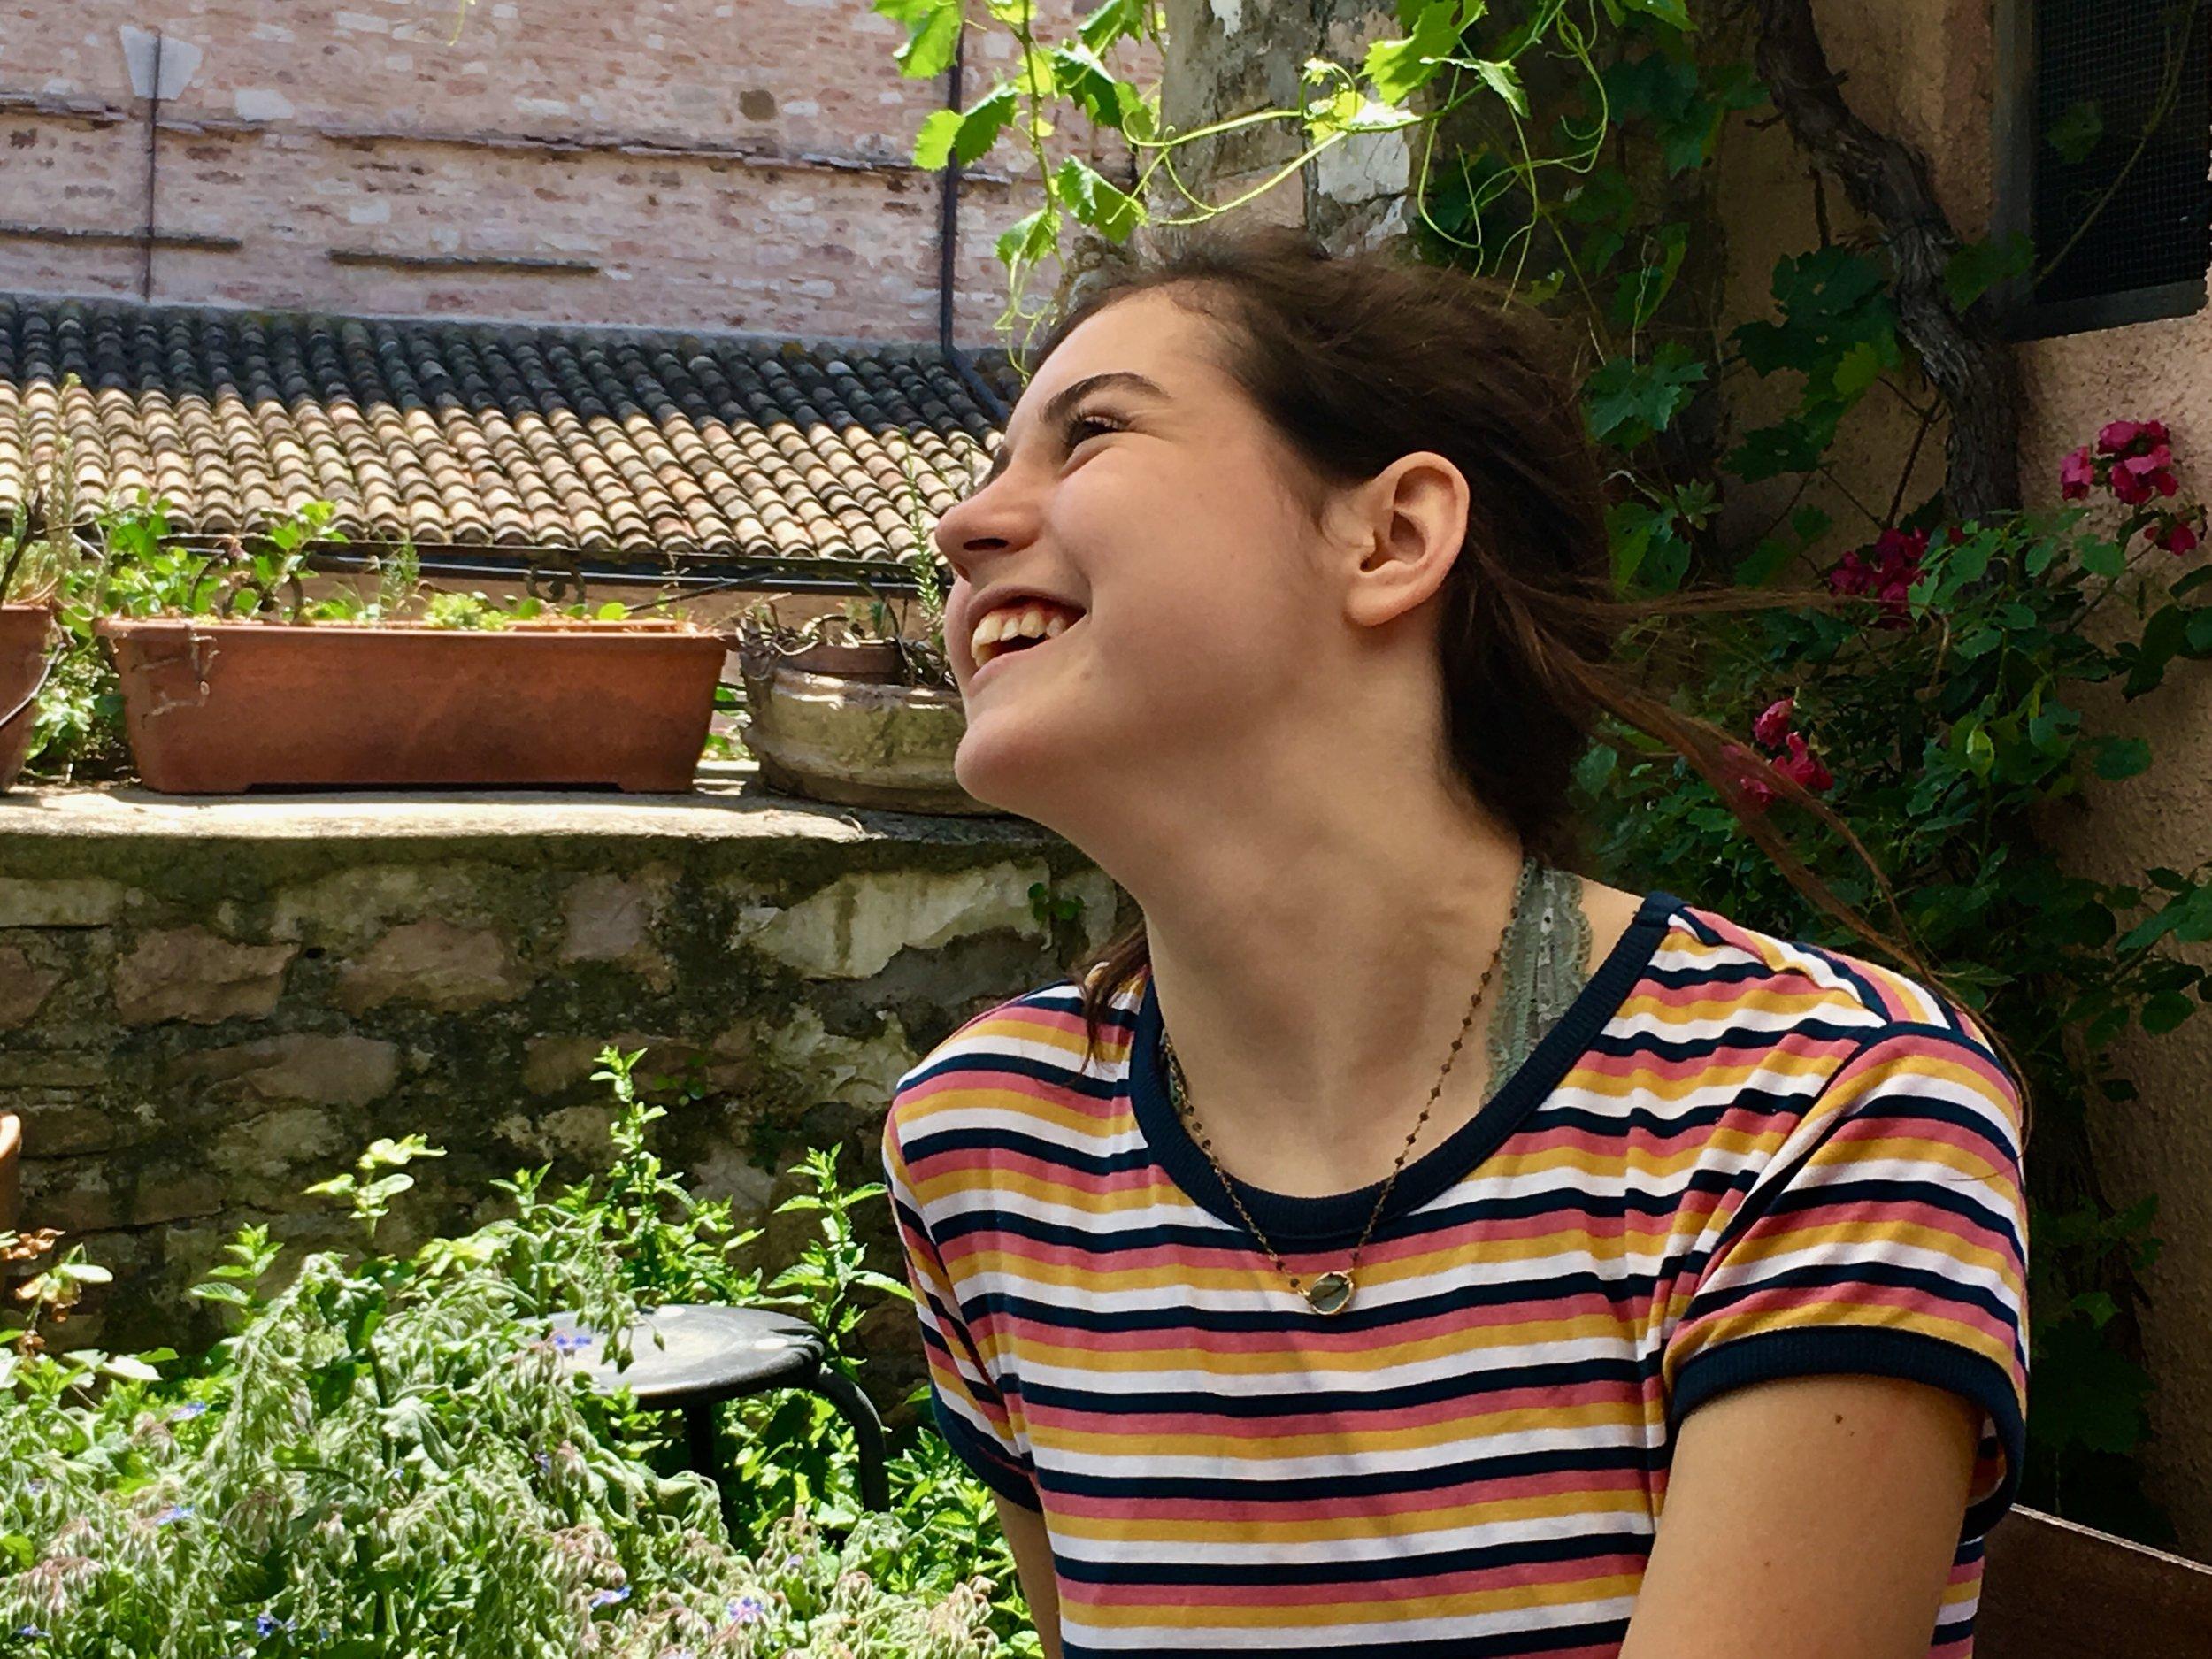 Siena in the garden in Spello, Umbria